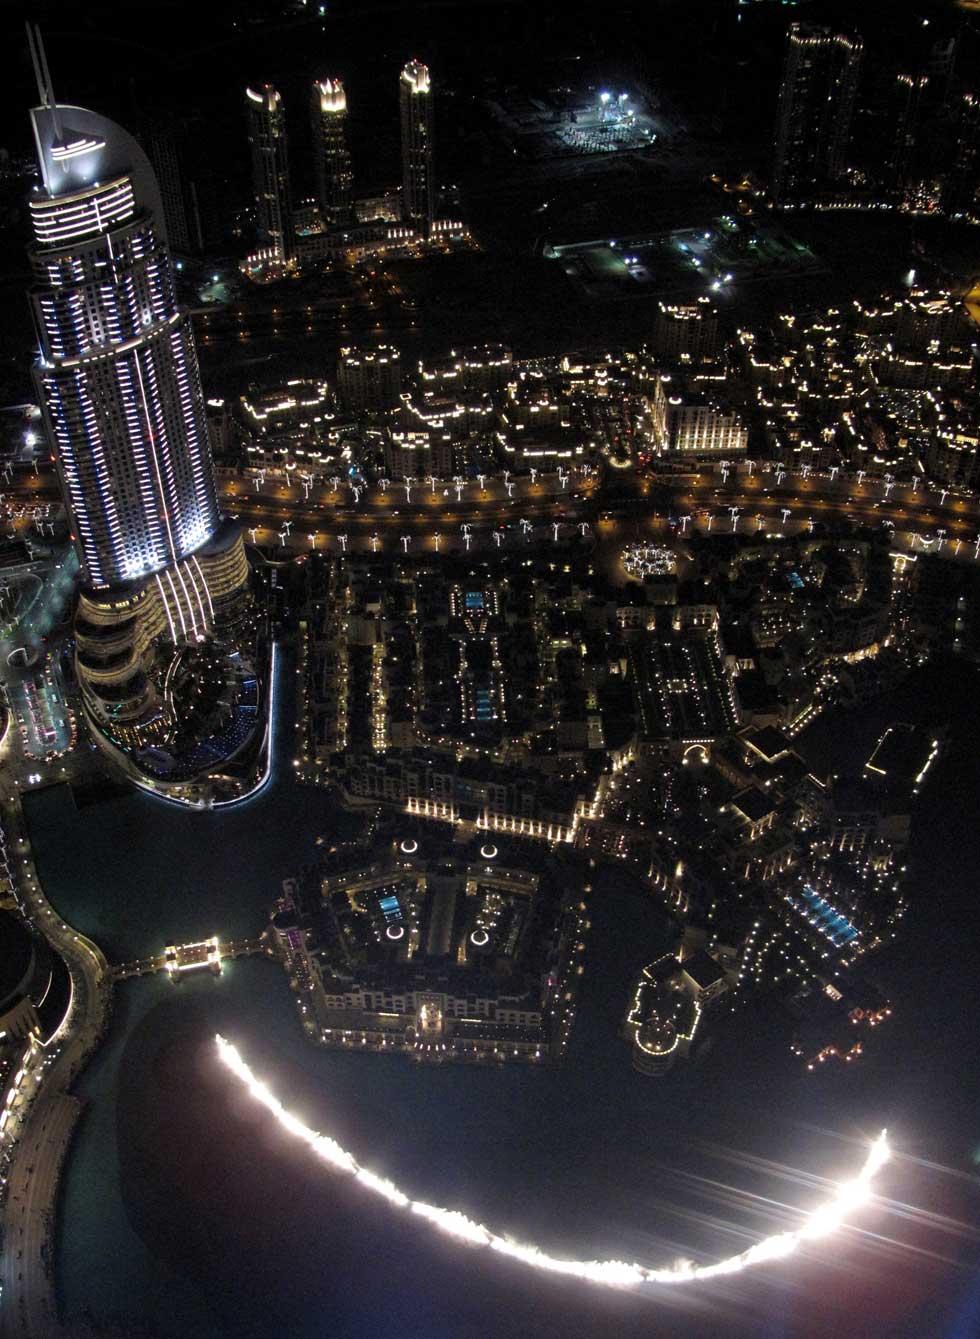 A fonte perto do Dubai Mall e Souk al Bahar, vista do piso-miradouro da torre Burj Khalifa